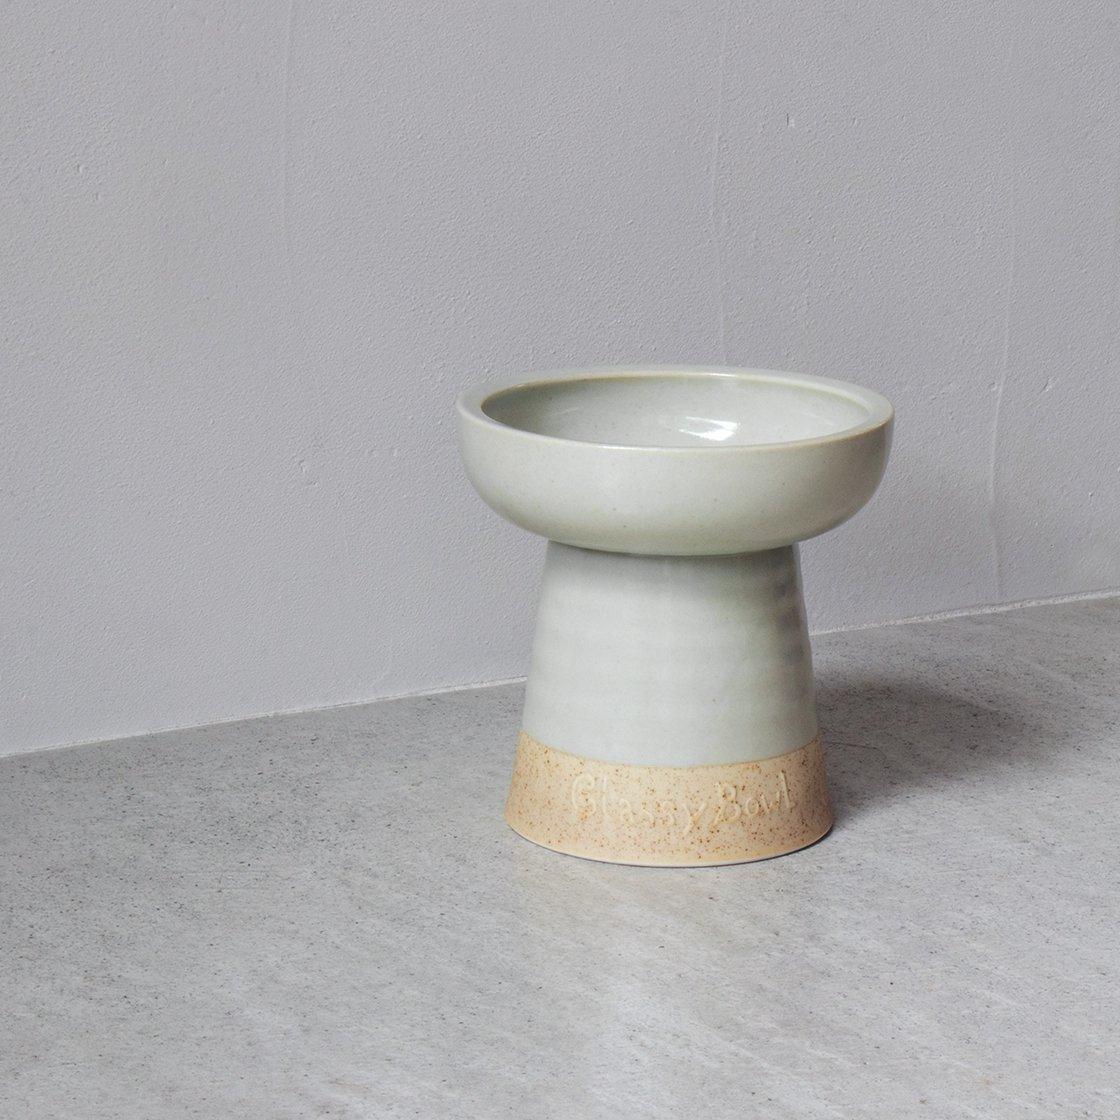 Classy Bowl【5インチ】古釉×梨地釉の掛け分け Made in Japan